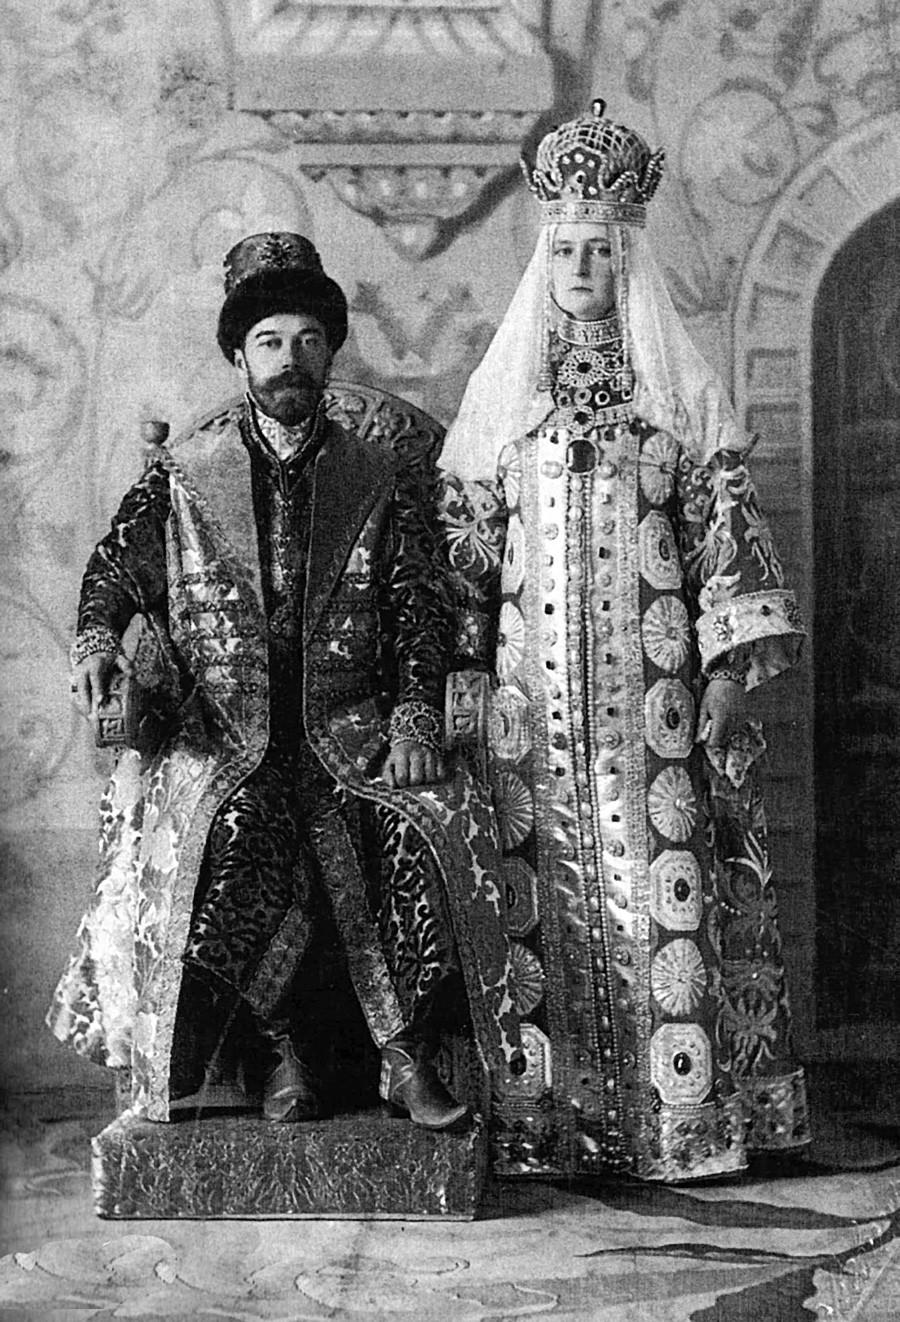 Nicolas II de Russie et Alexandra Fiodorovna (Alix de Hesse) en costumes russes. 1913, célébration du tricentenaire de la dynastie des Romanov